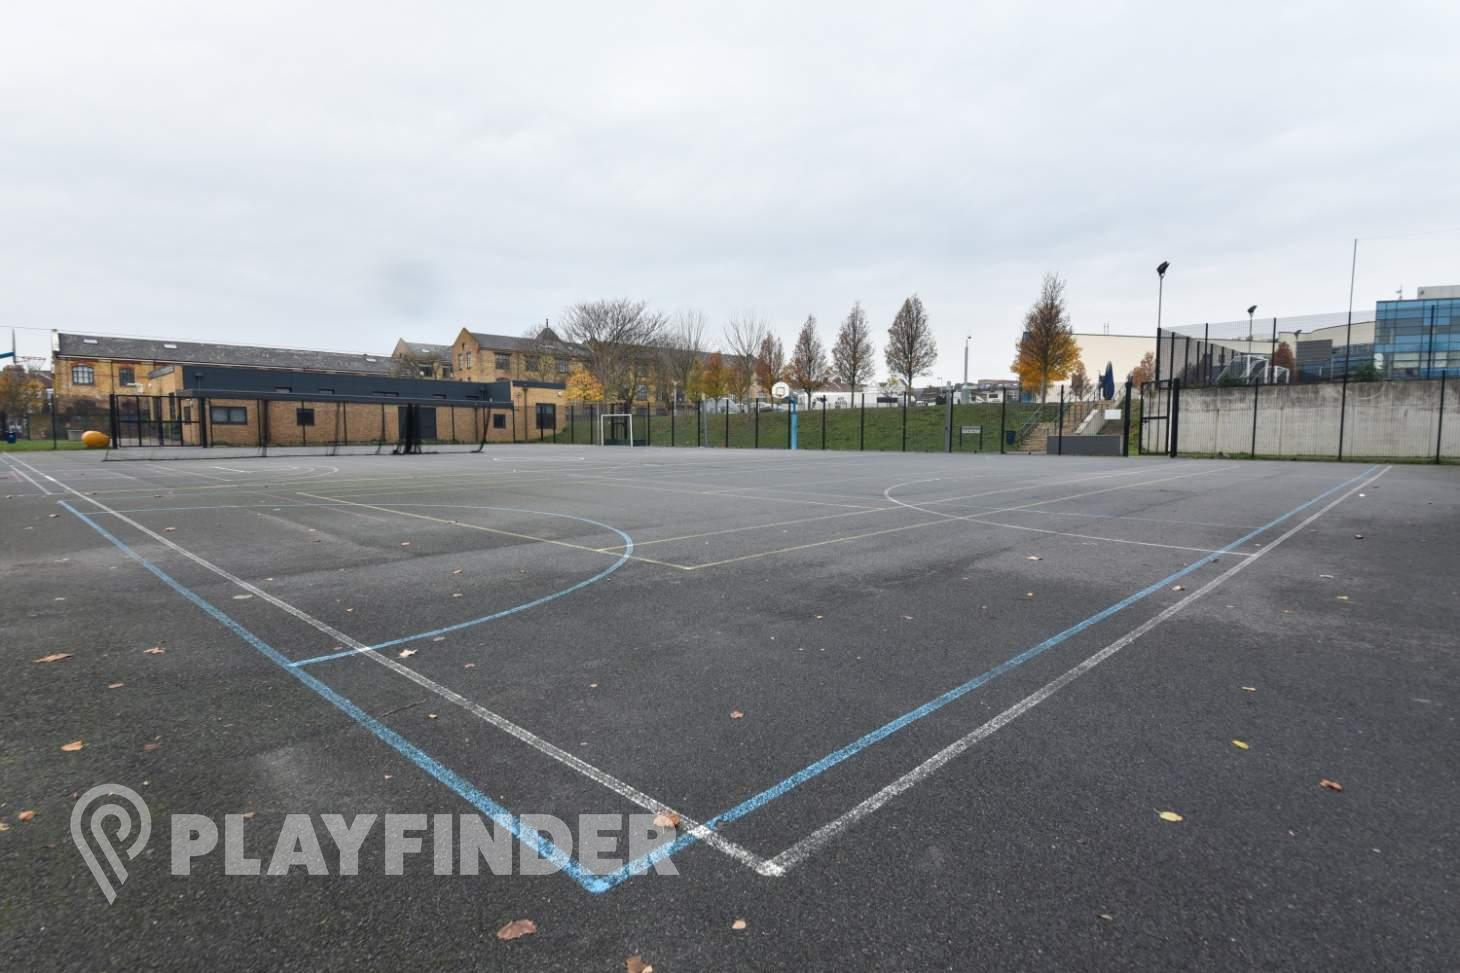 The Petchey Academy Sports Club Outdoor | Hard (macadam) netball court